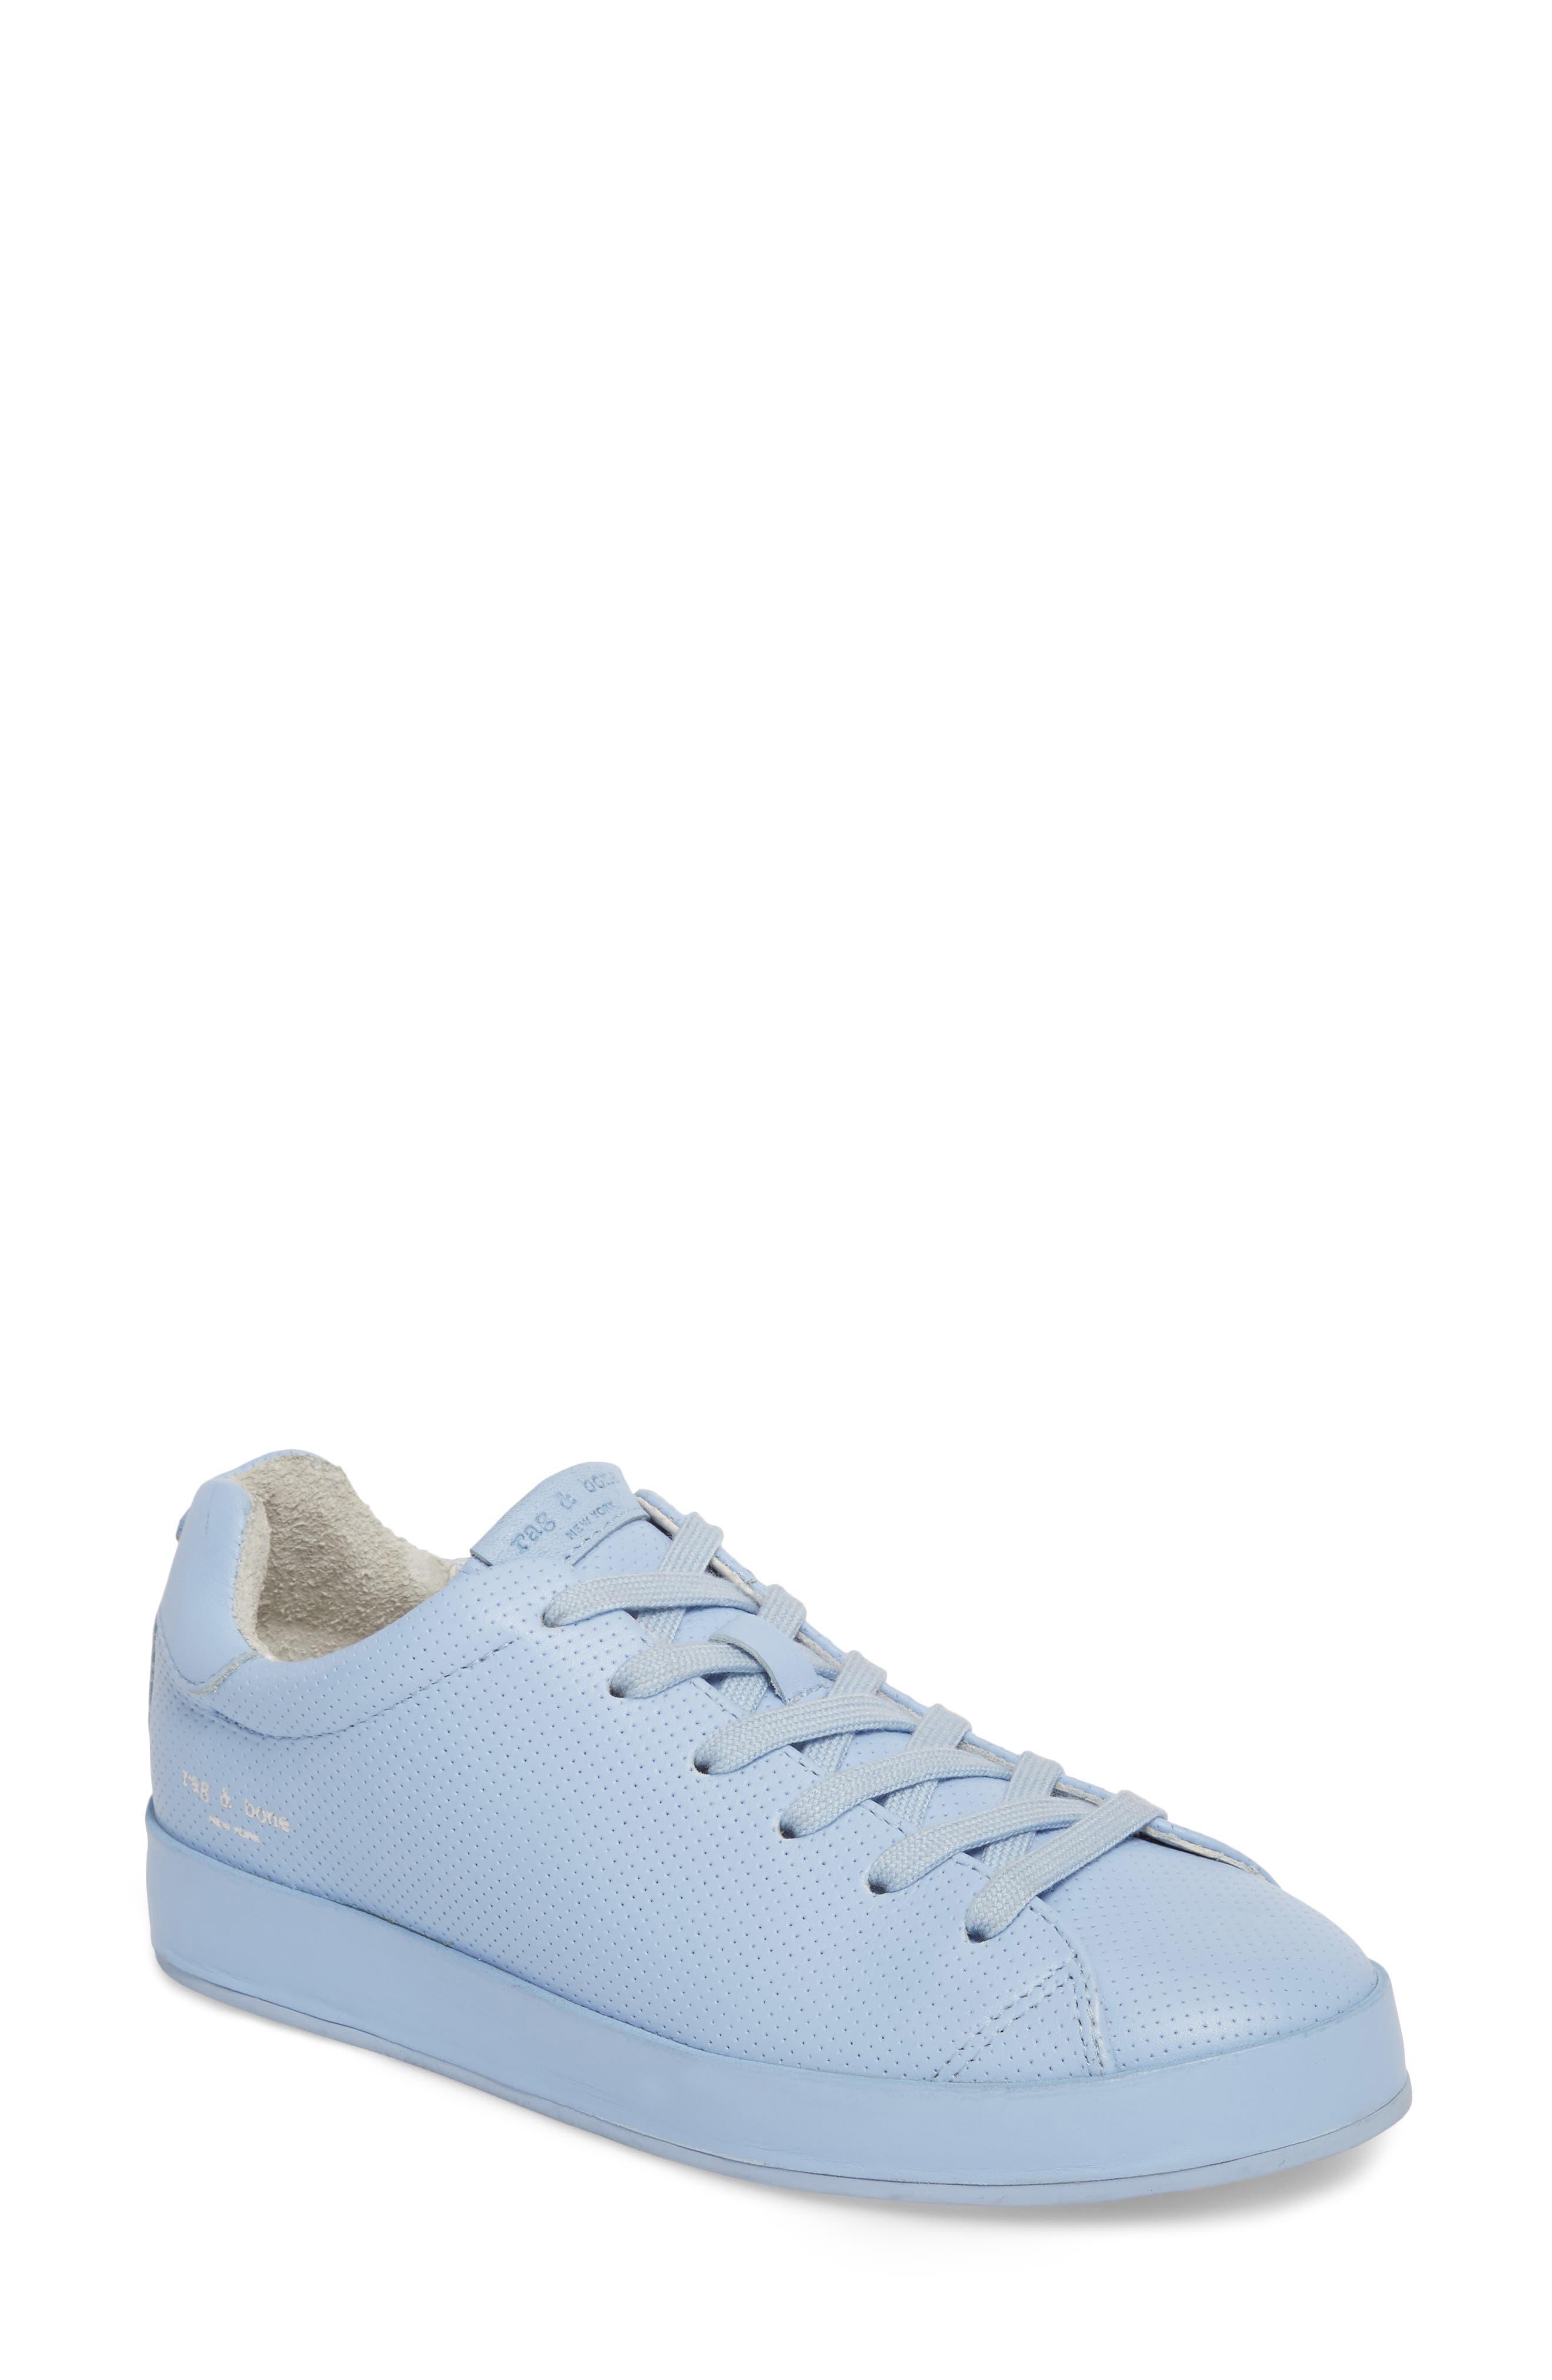 Alternate Image 1 Selected - rag & bone RB1 Low-Top Sneaker (Women)